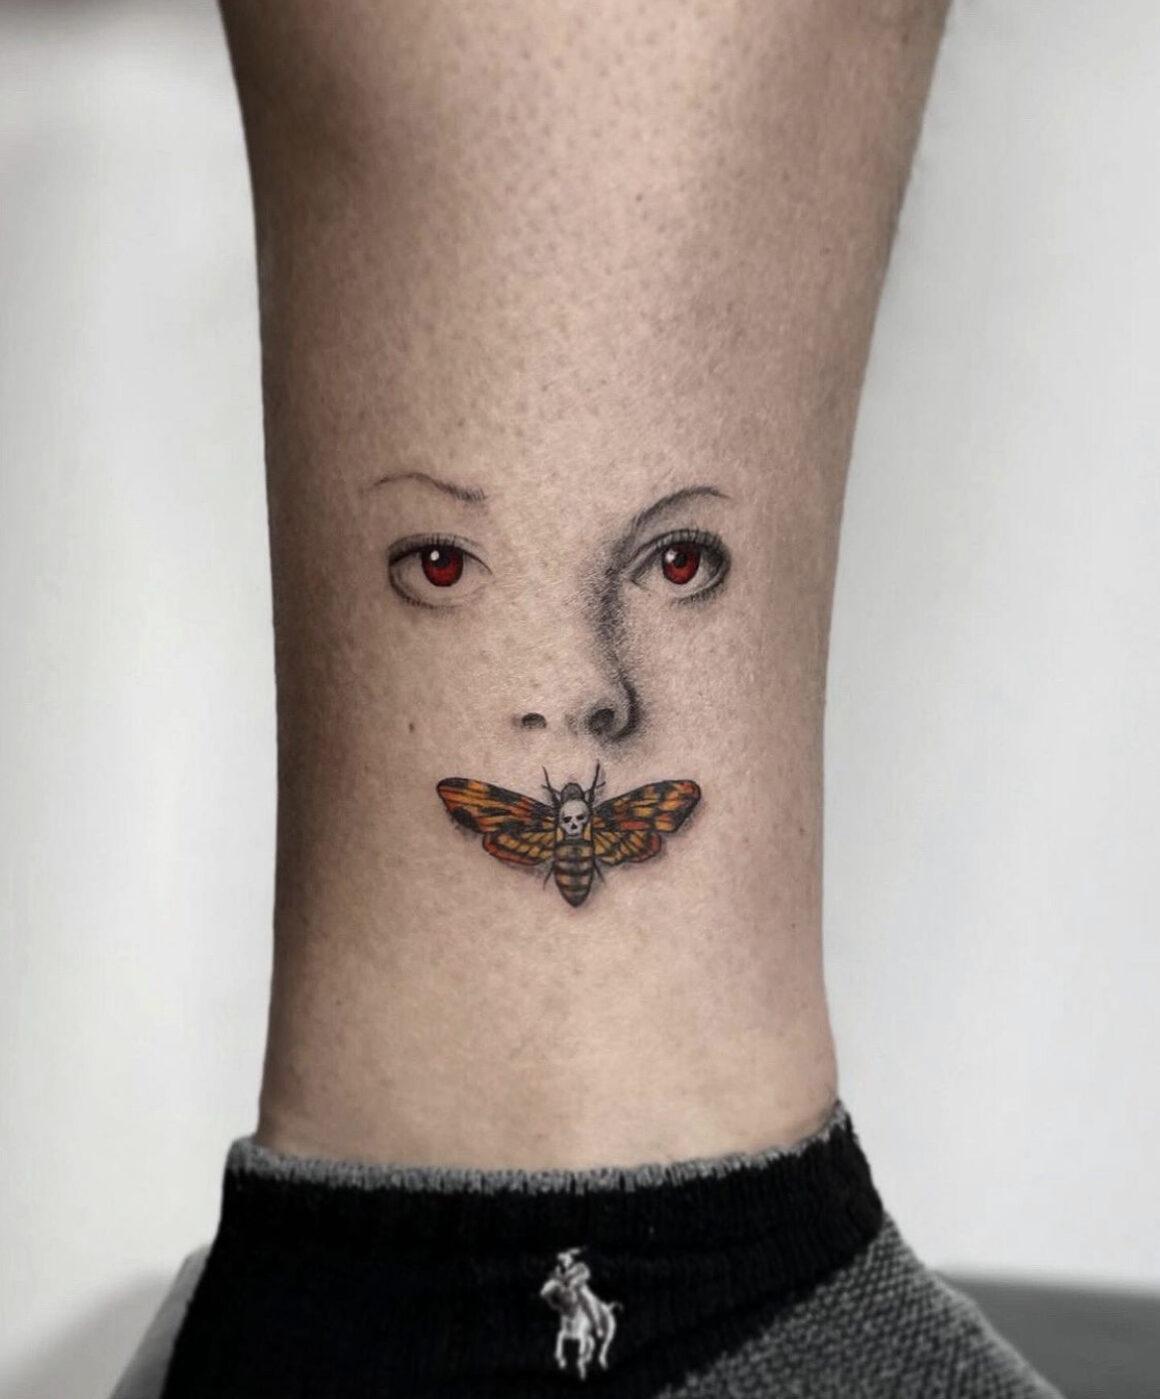 Yadi, West 4 Tattoo, New York, USA